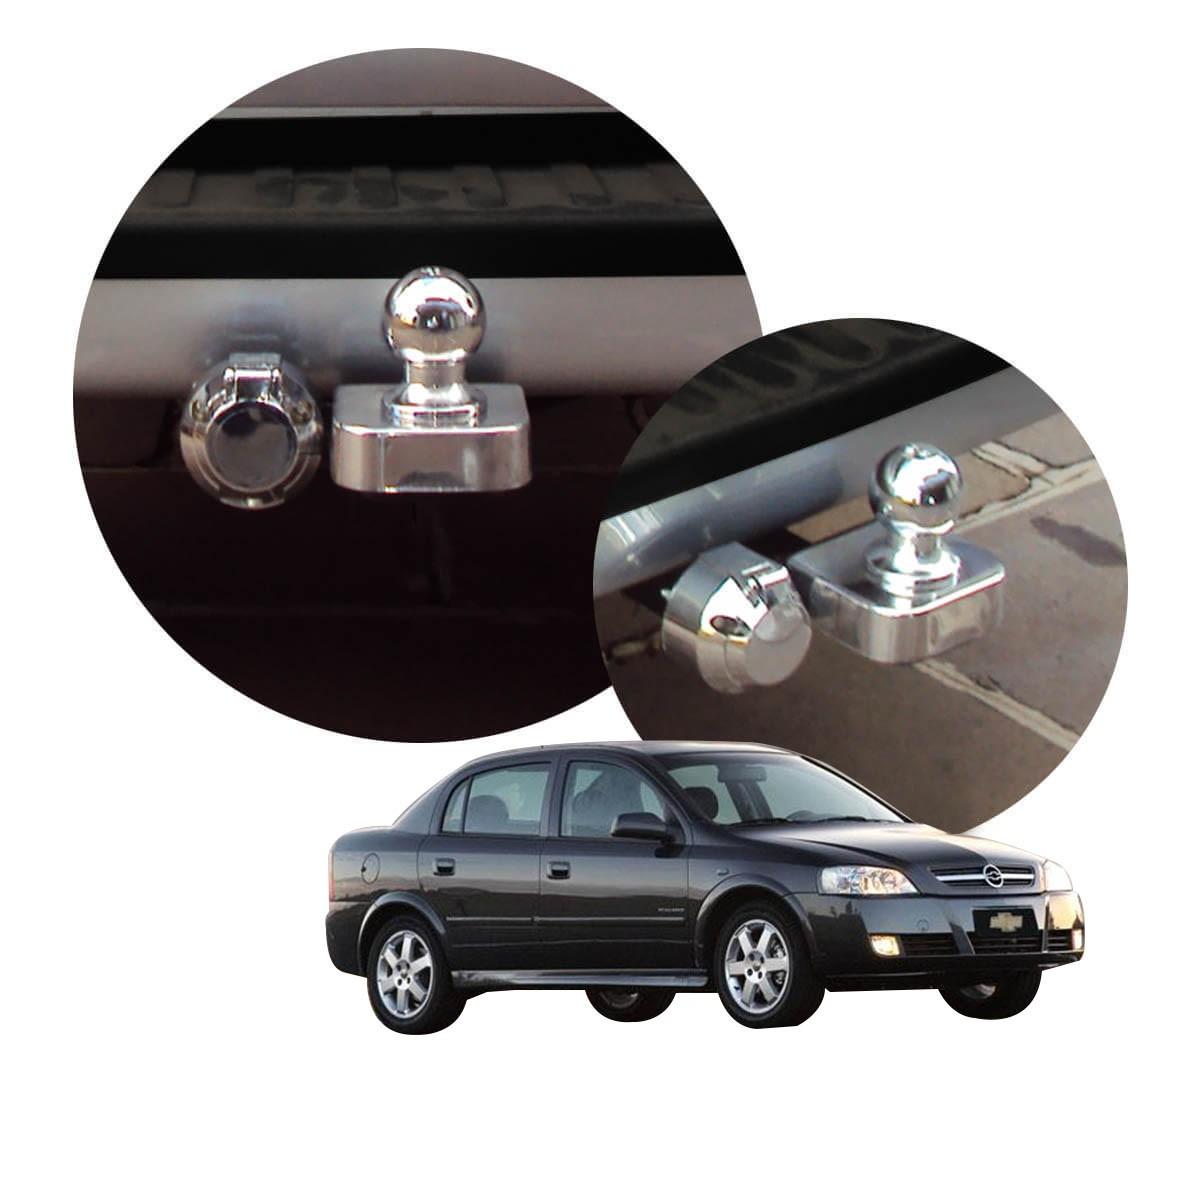 Engate de reboque fixo Astra sedan 2005 a 2011